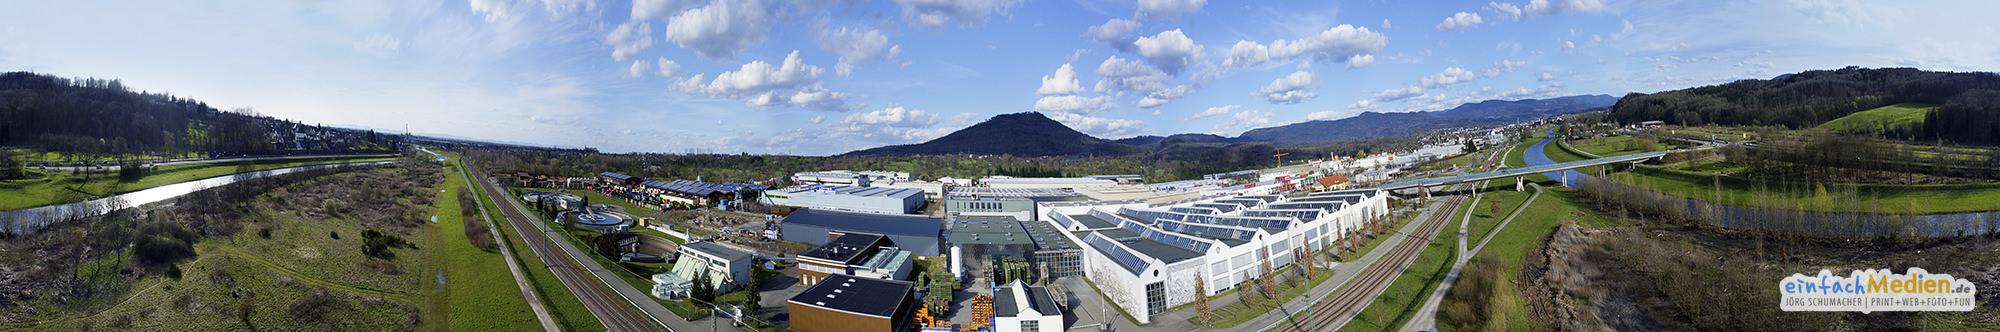 DSC4015_Panorama_Rotenfels_Industriegebiet Luftbilder